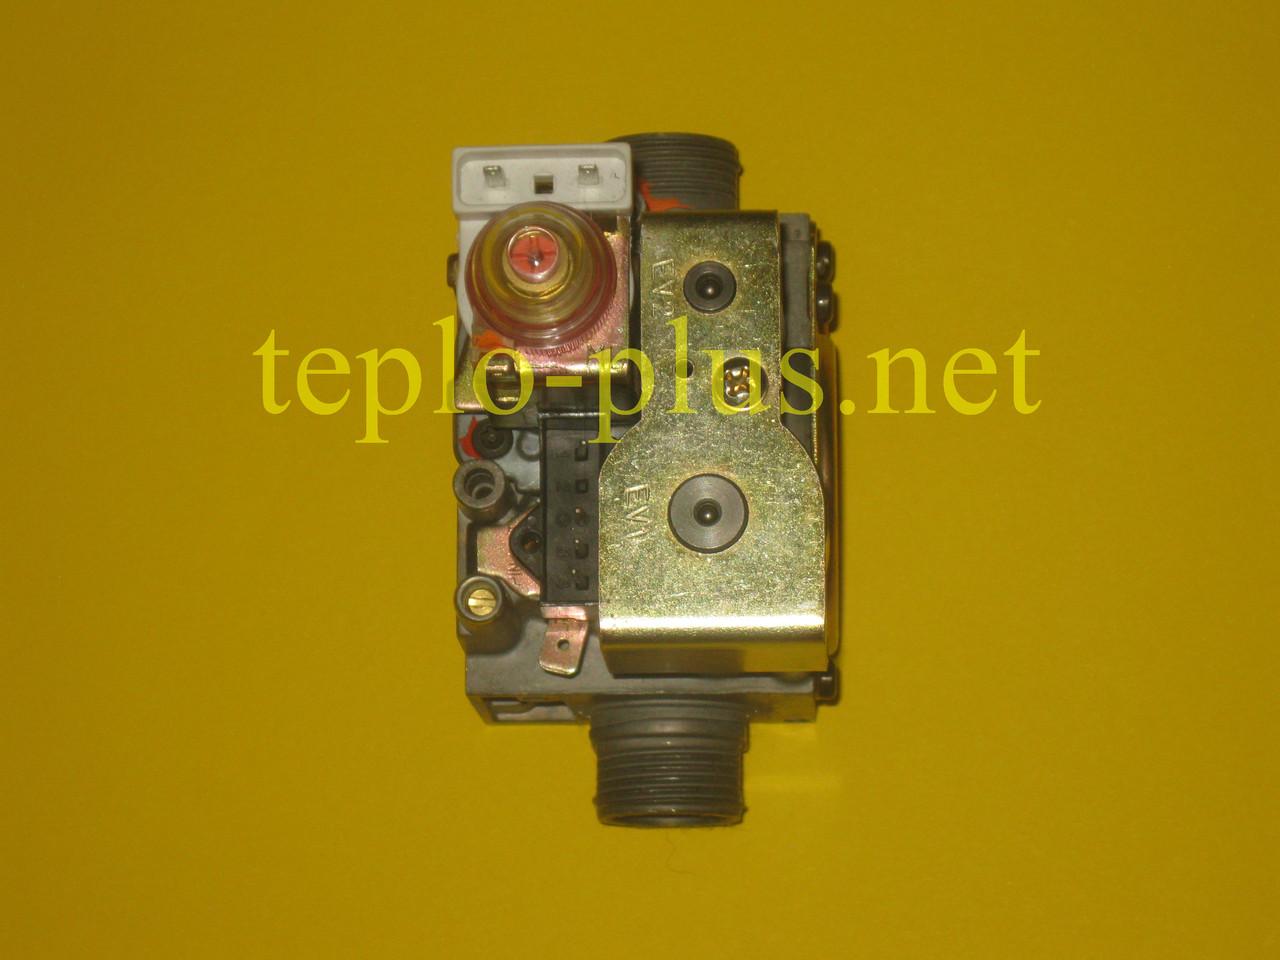 Газовый клапан 845 SIGMA 0.845.063 Baxi, Westen, Roca Neobit, Hermann, Immergas, фото 2